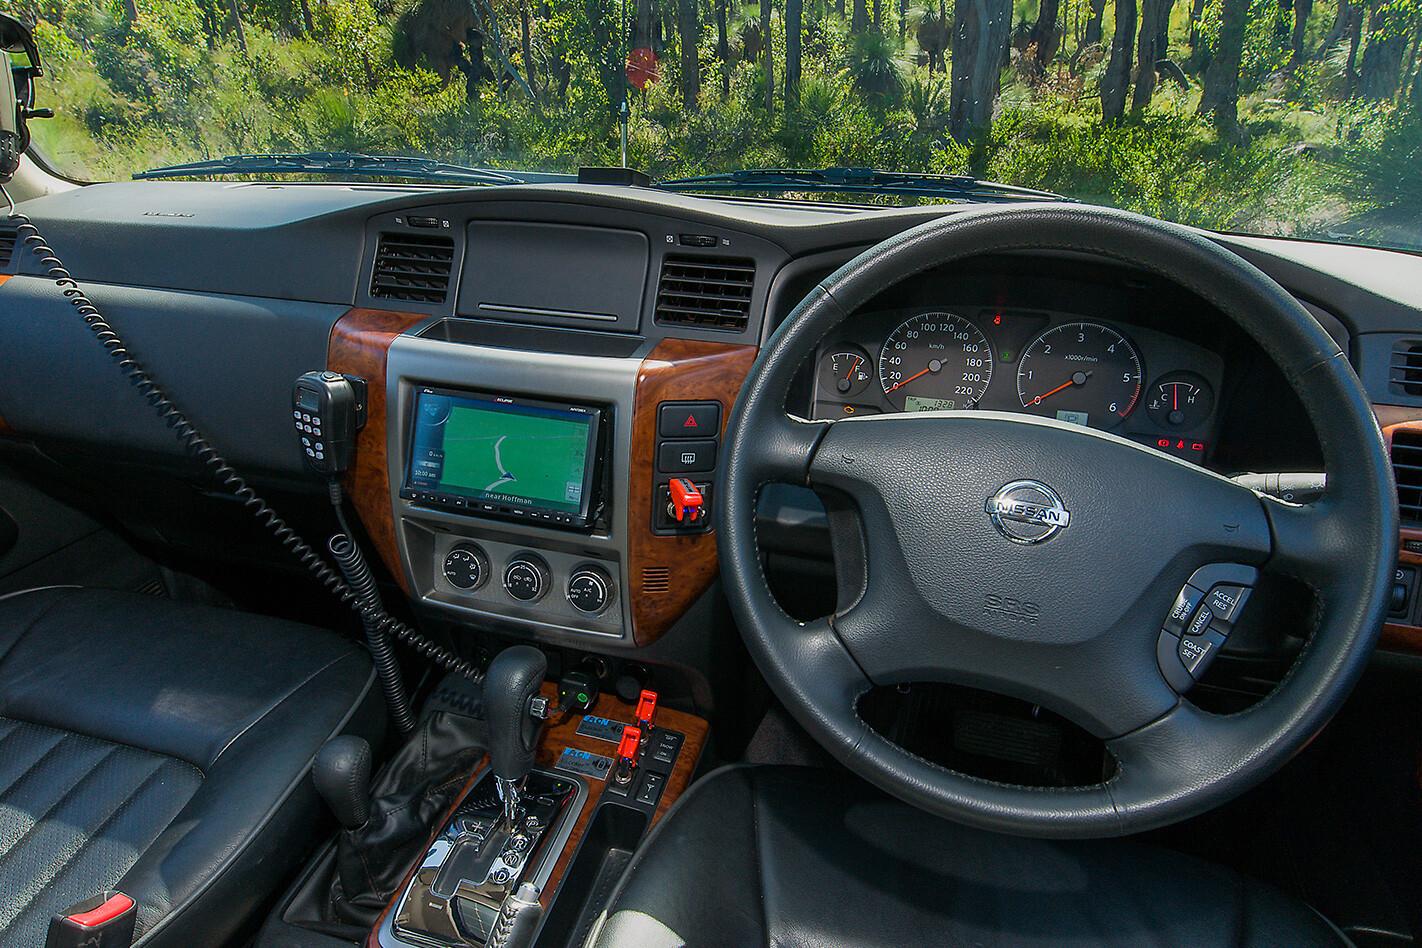 2010 Nissan Patrol GU7 Ti interior